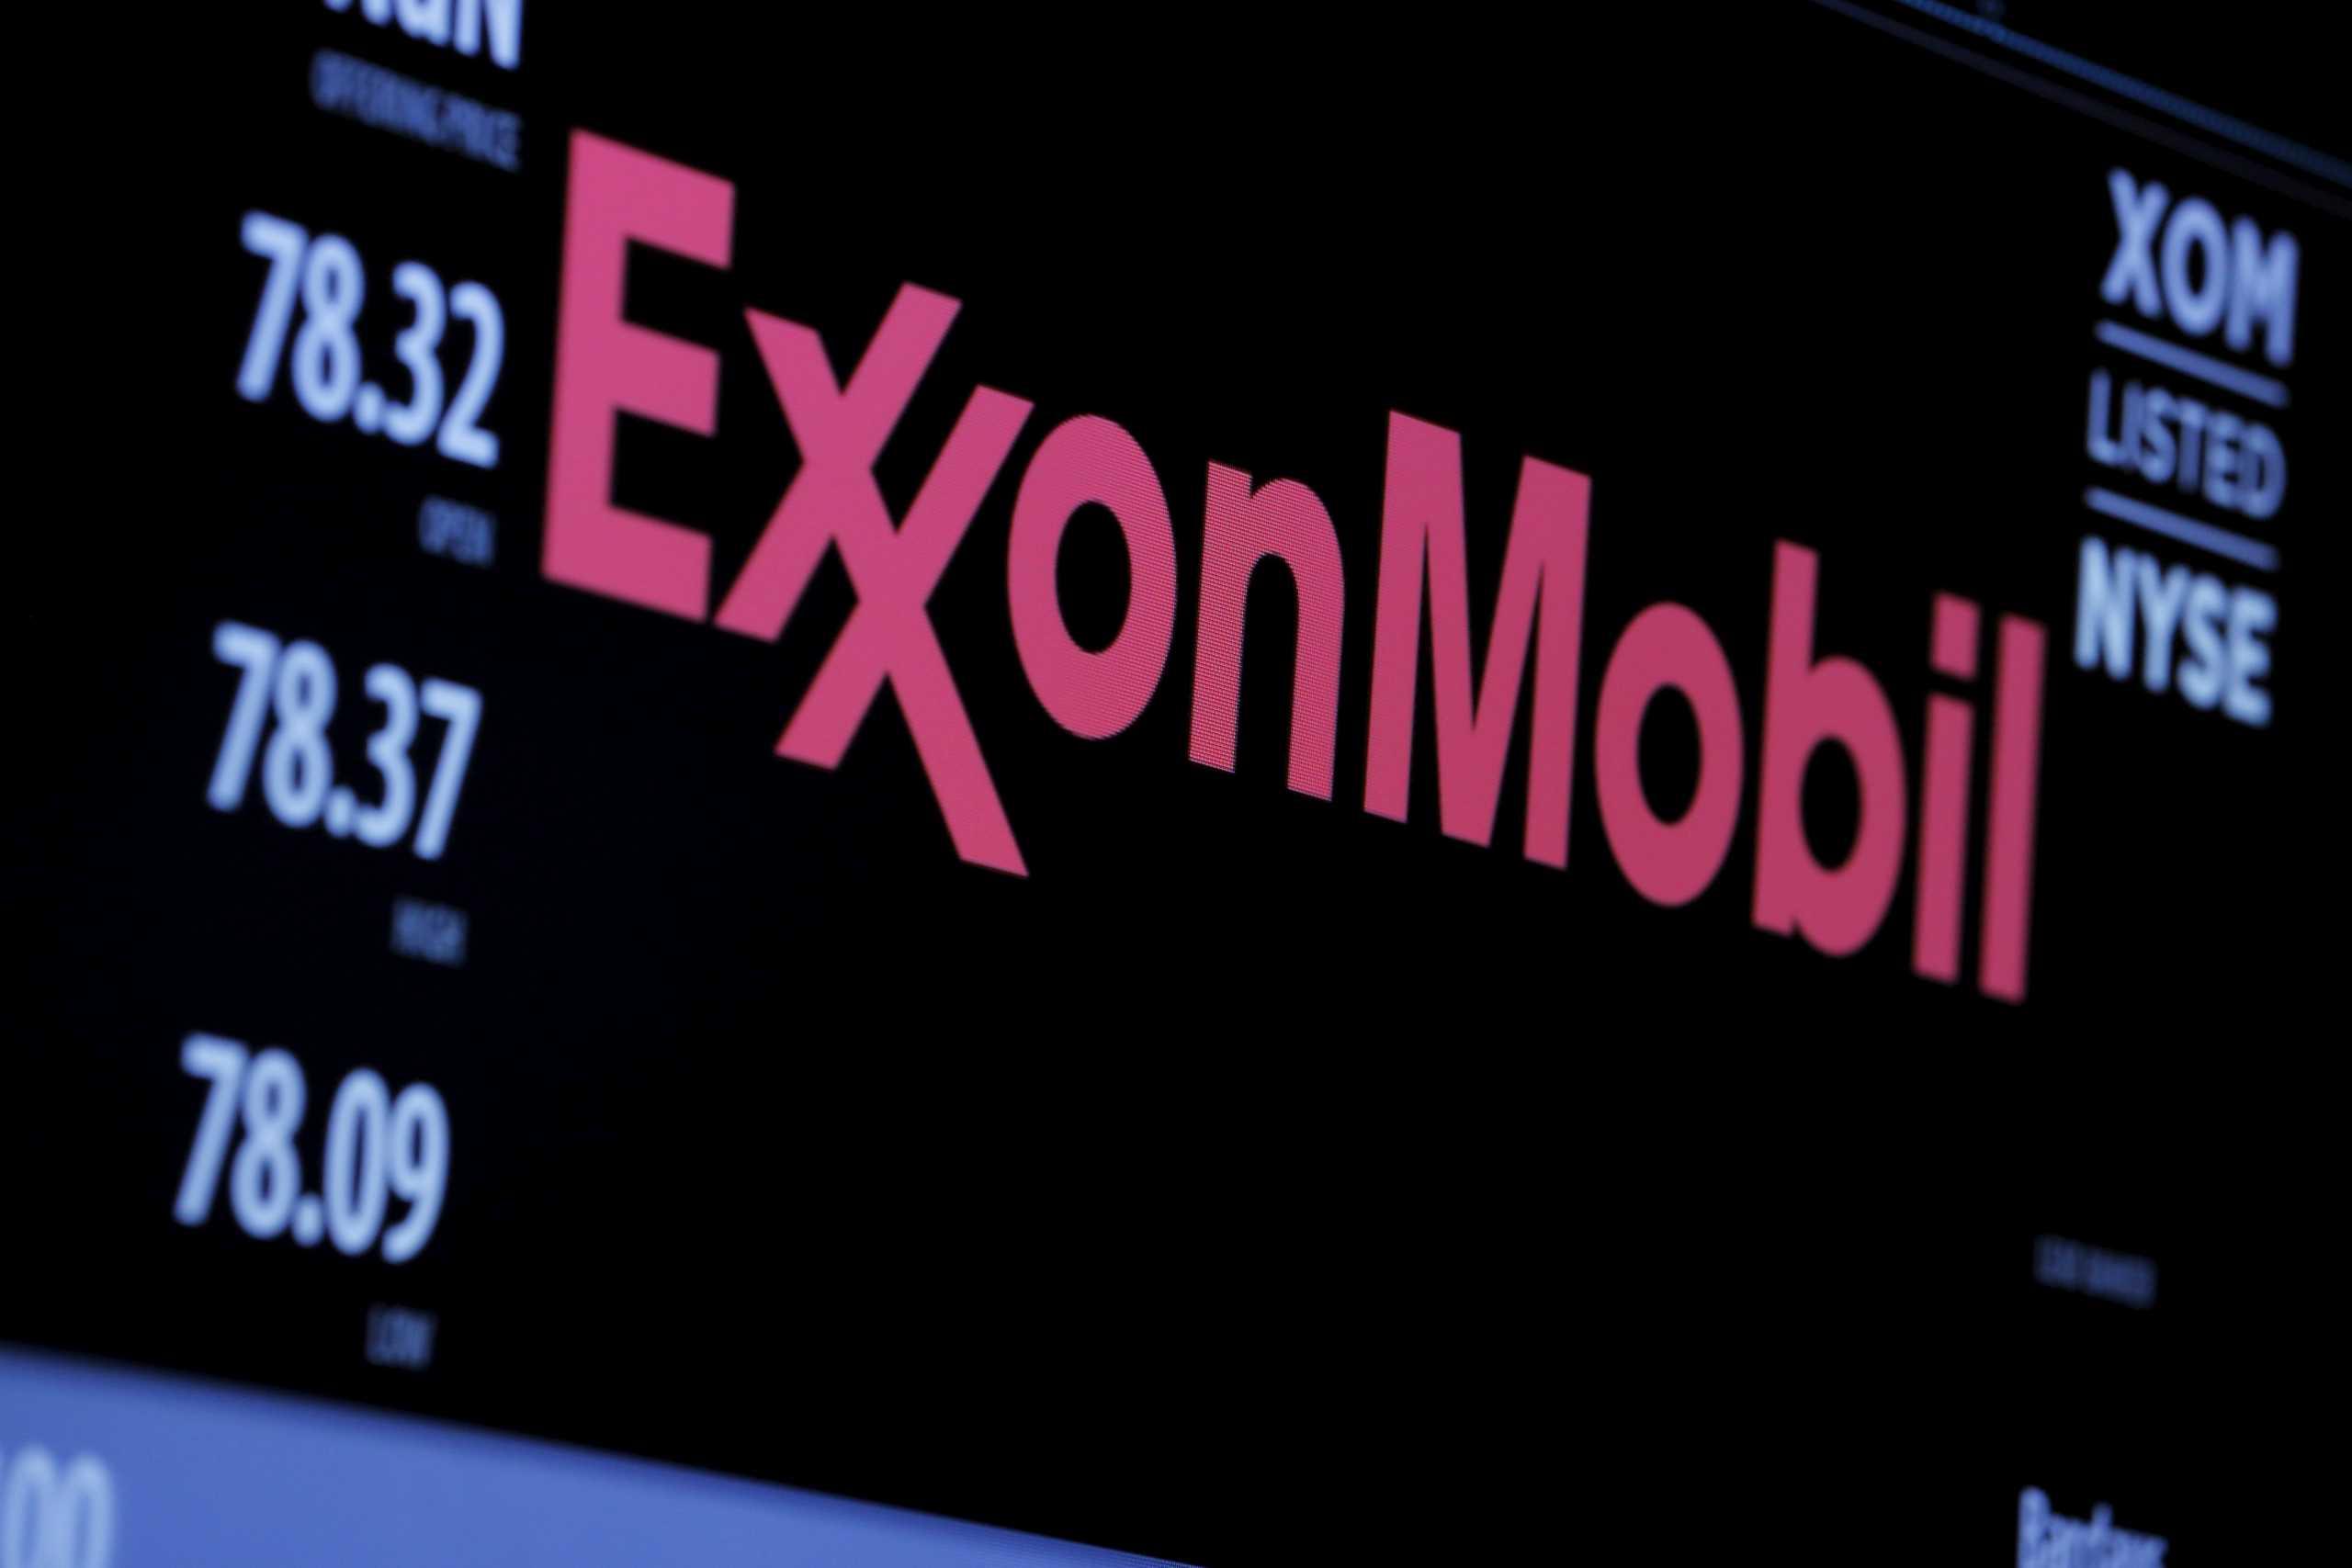 ExxonMobil και Chevron συζήτησαν για συγχώνευση